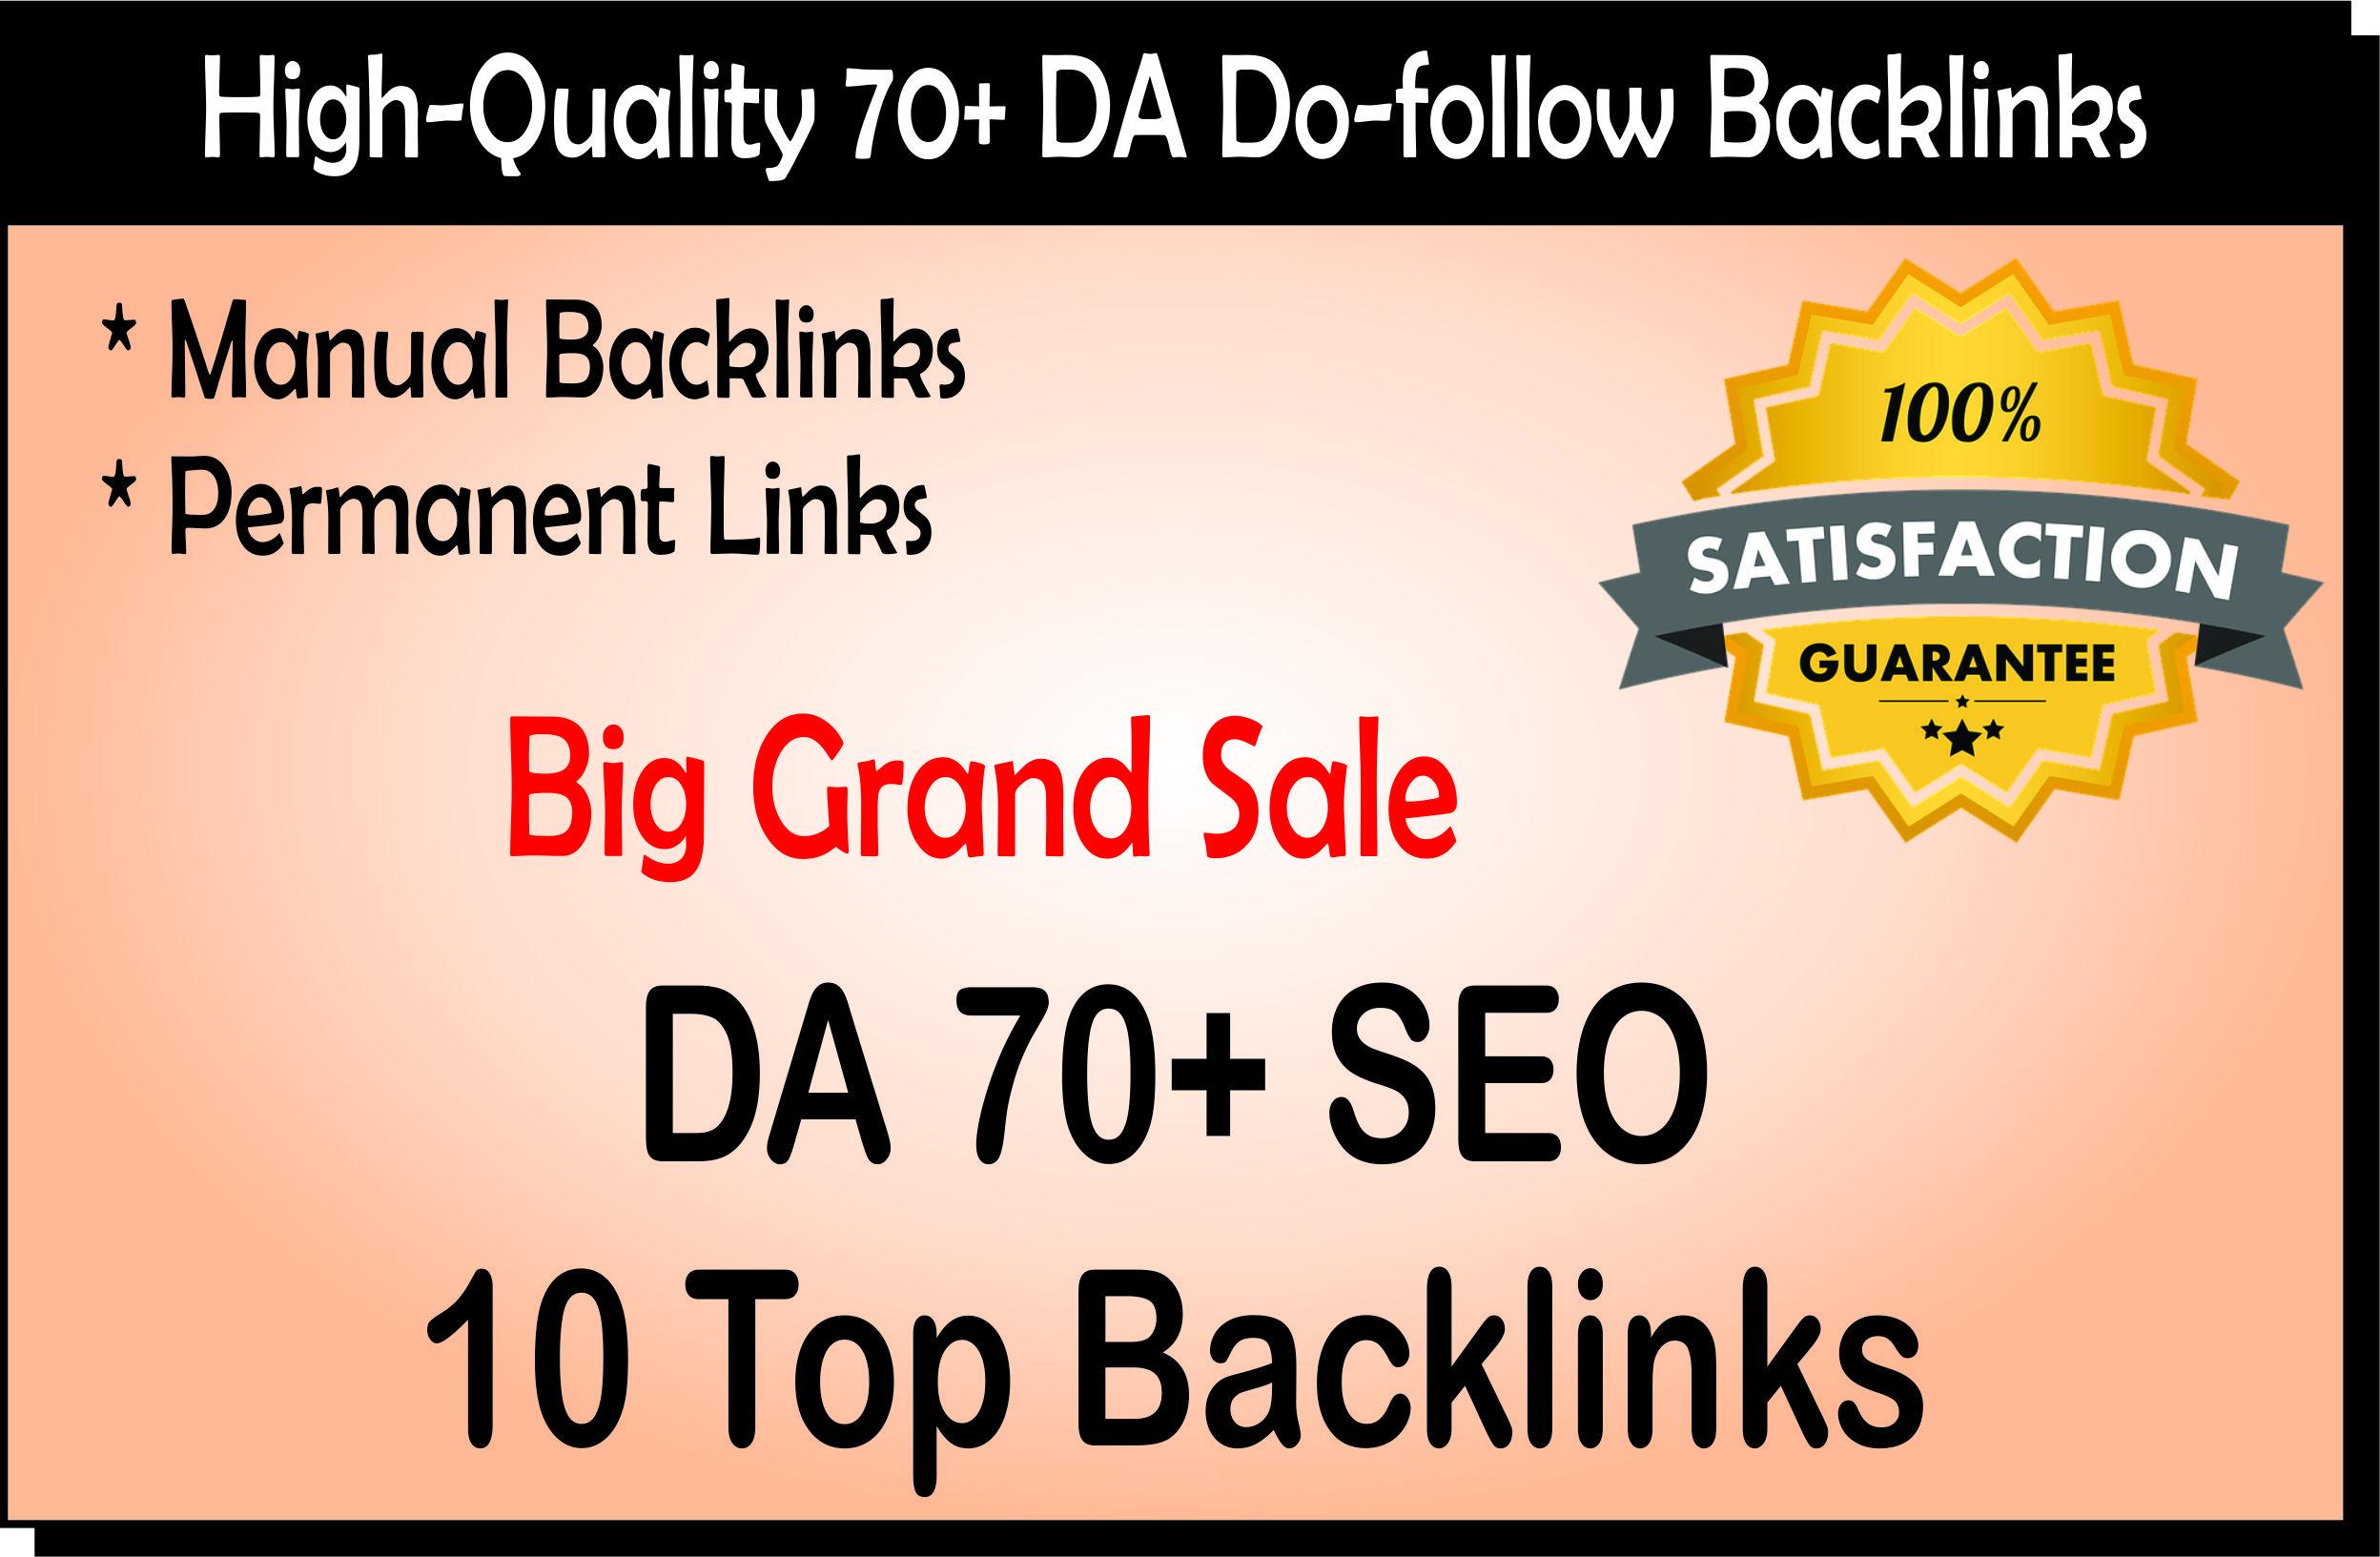 You Will Get 10 High Quality Backlinks On DA 70 Websites